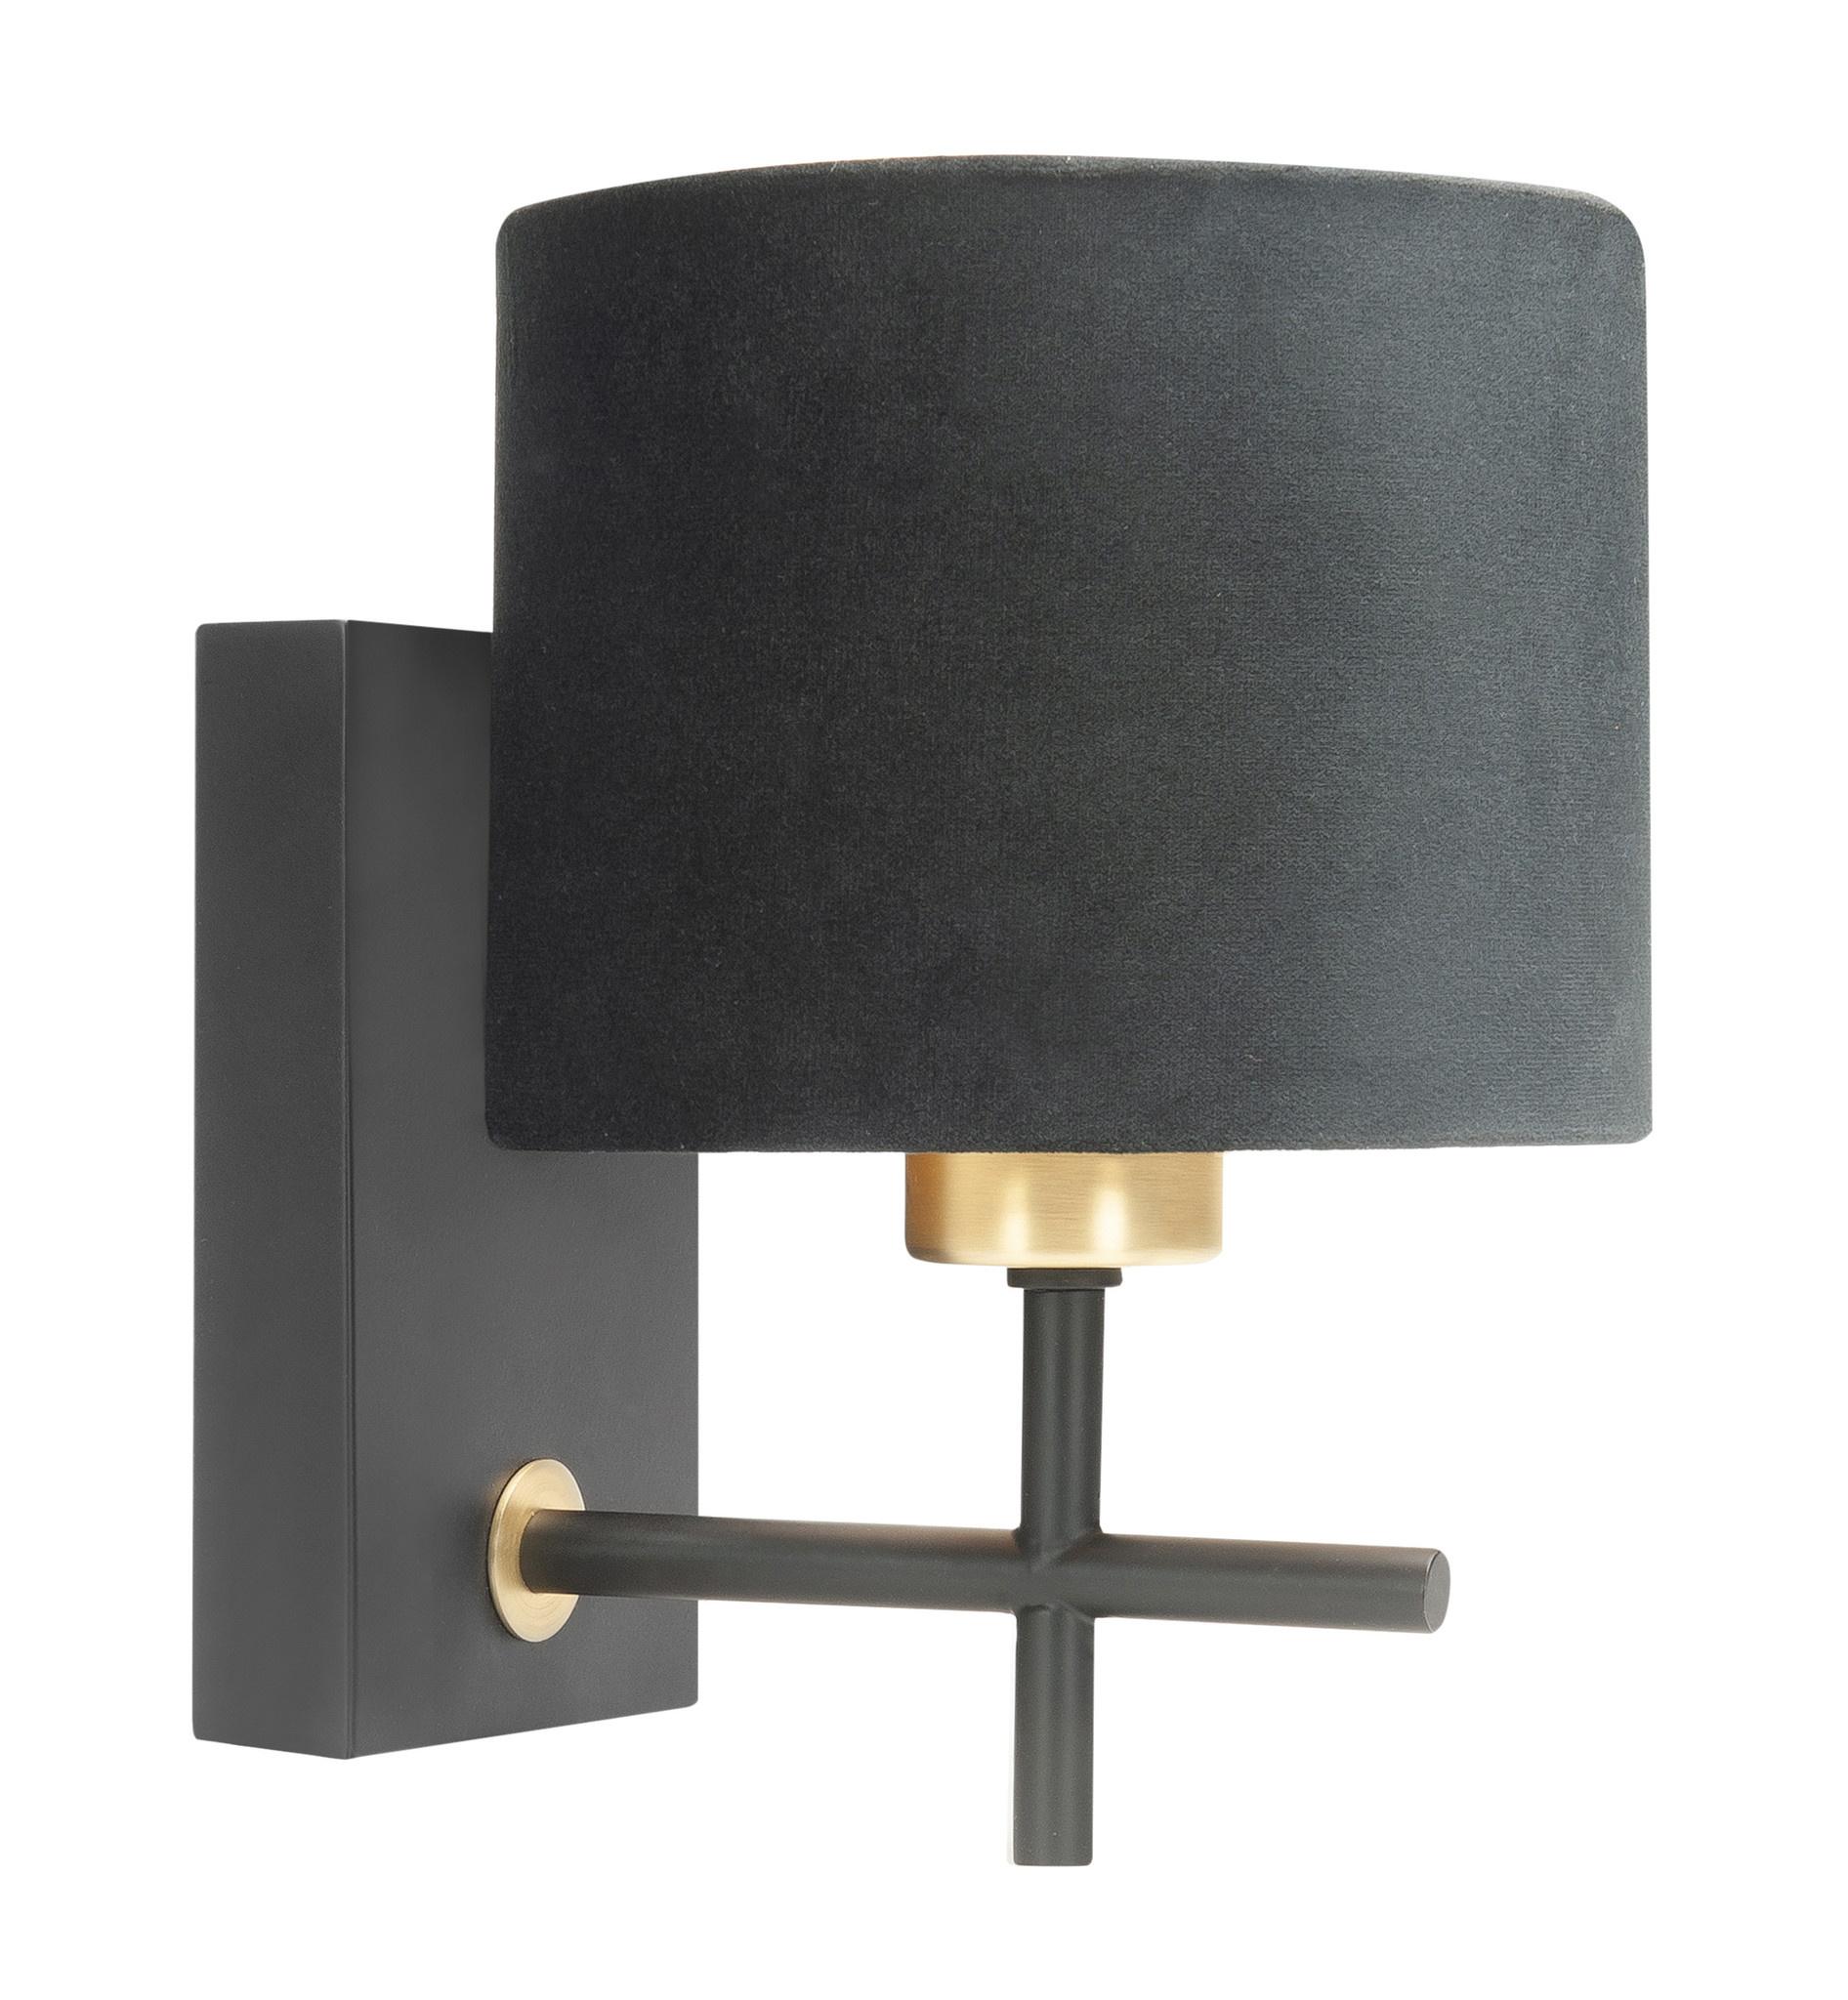 Highlight Wandlamp Torcia H 23 cm Ø 15 cm zwart goud